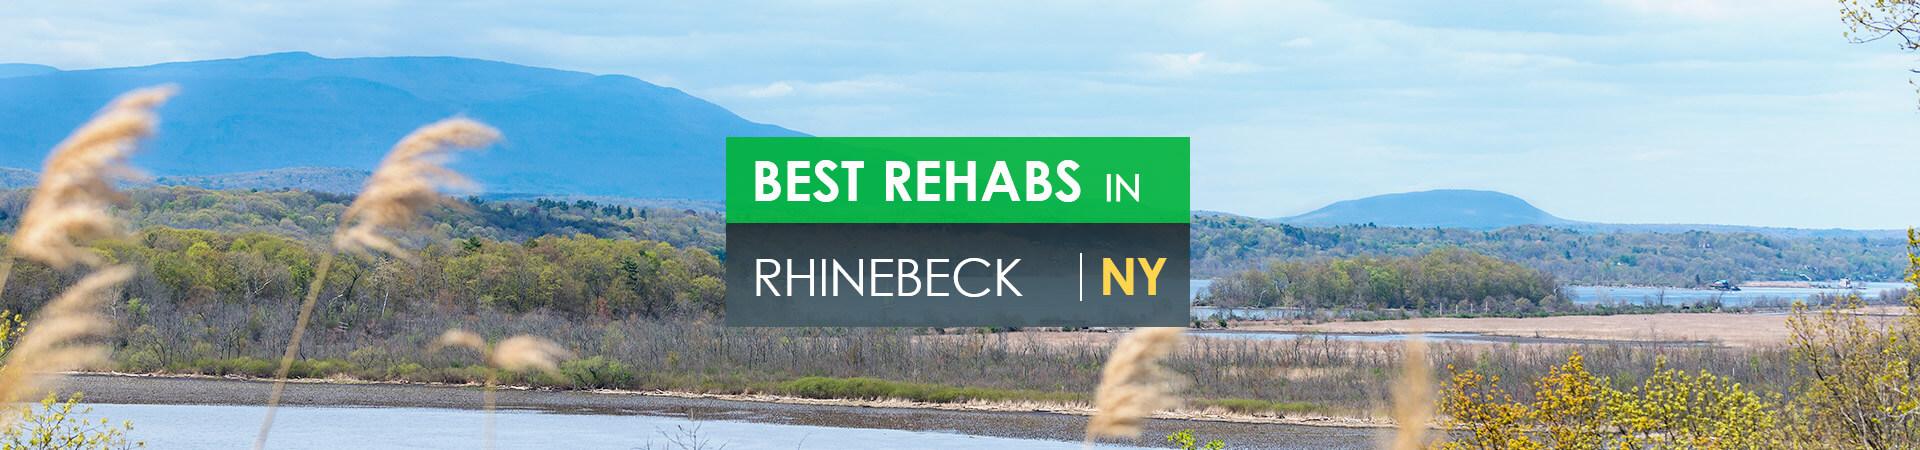 Best rehabs in Rhinebeck, NY